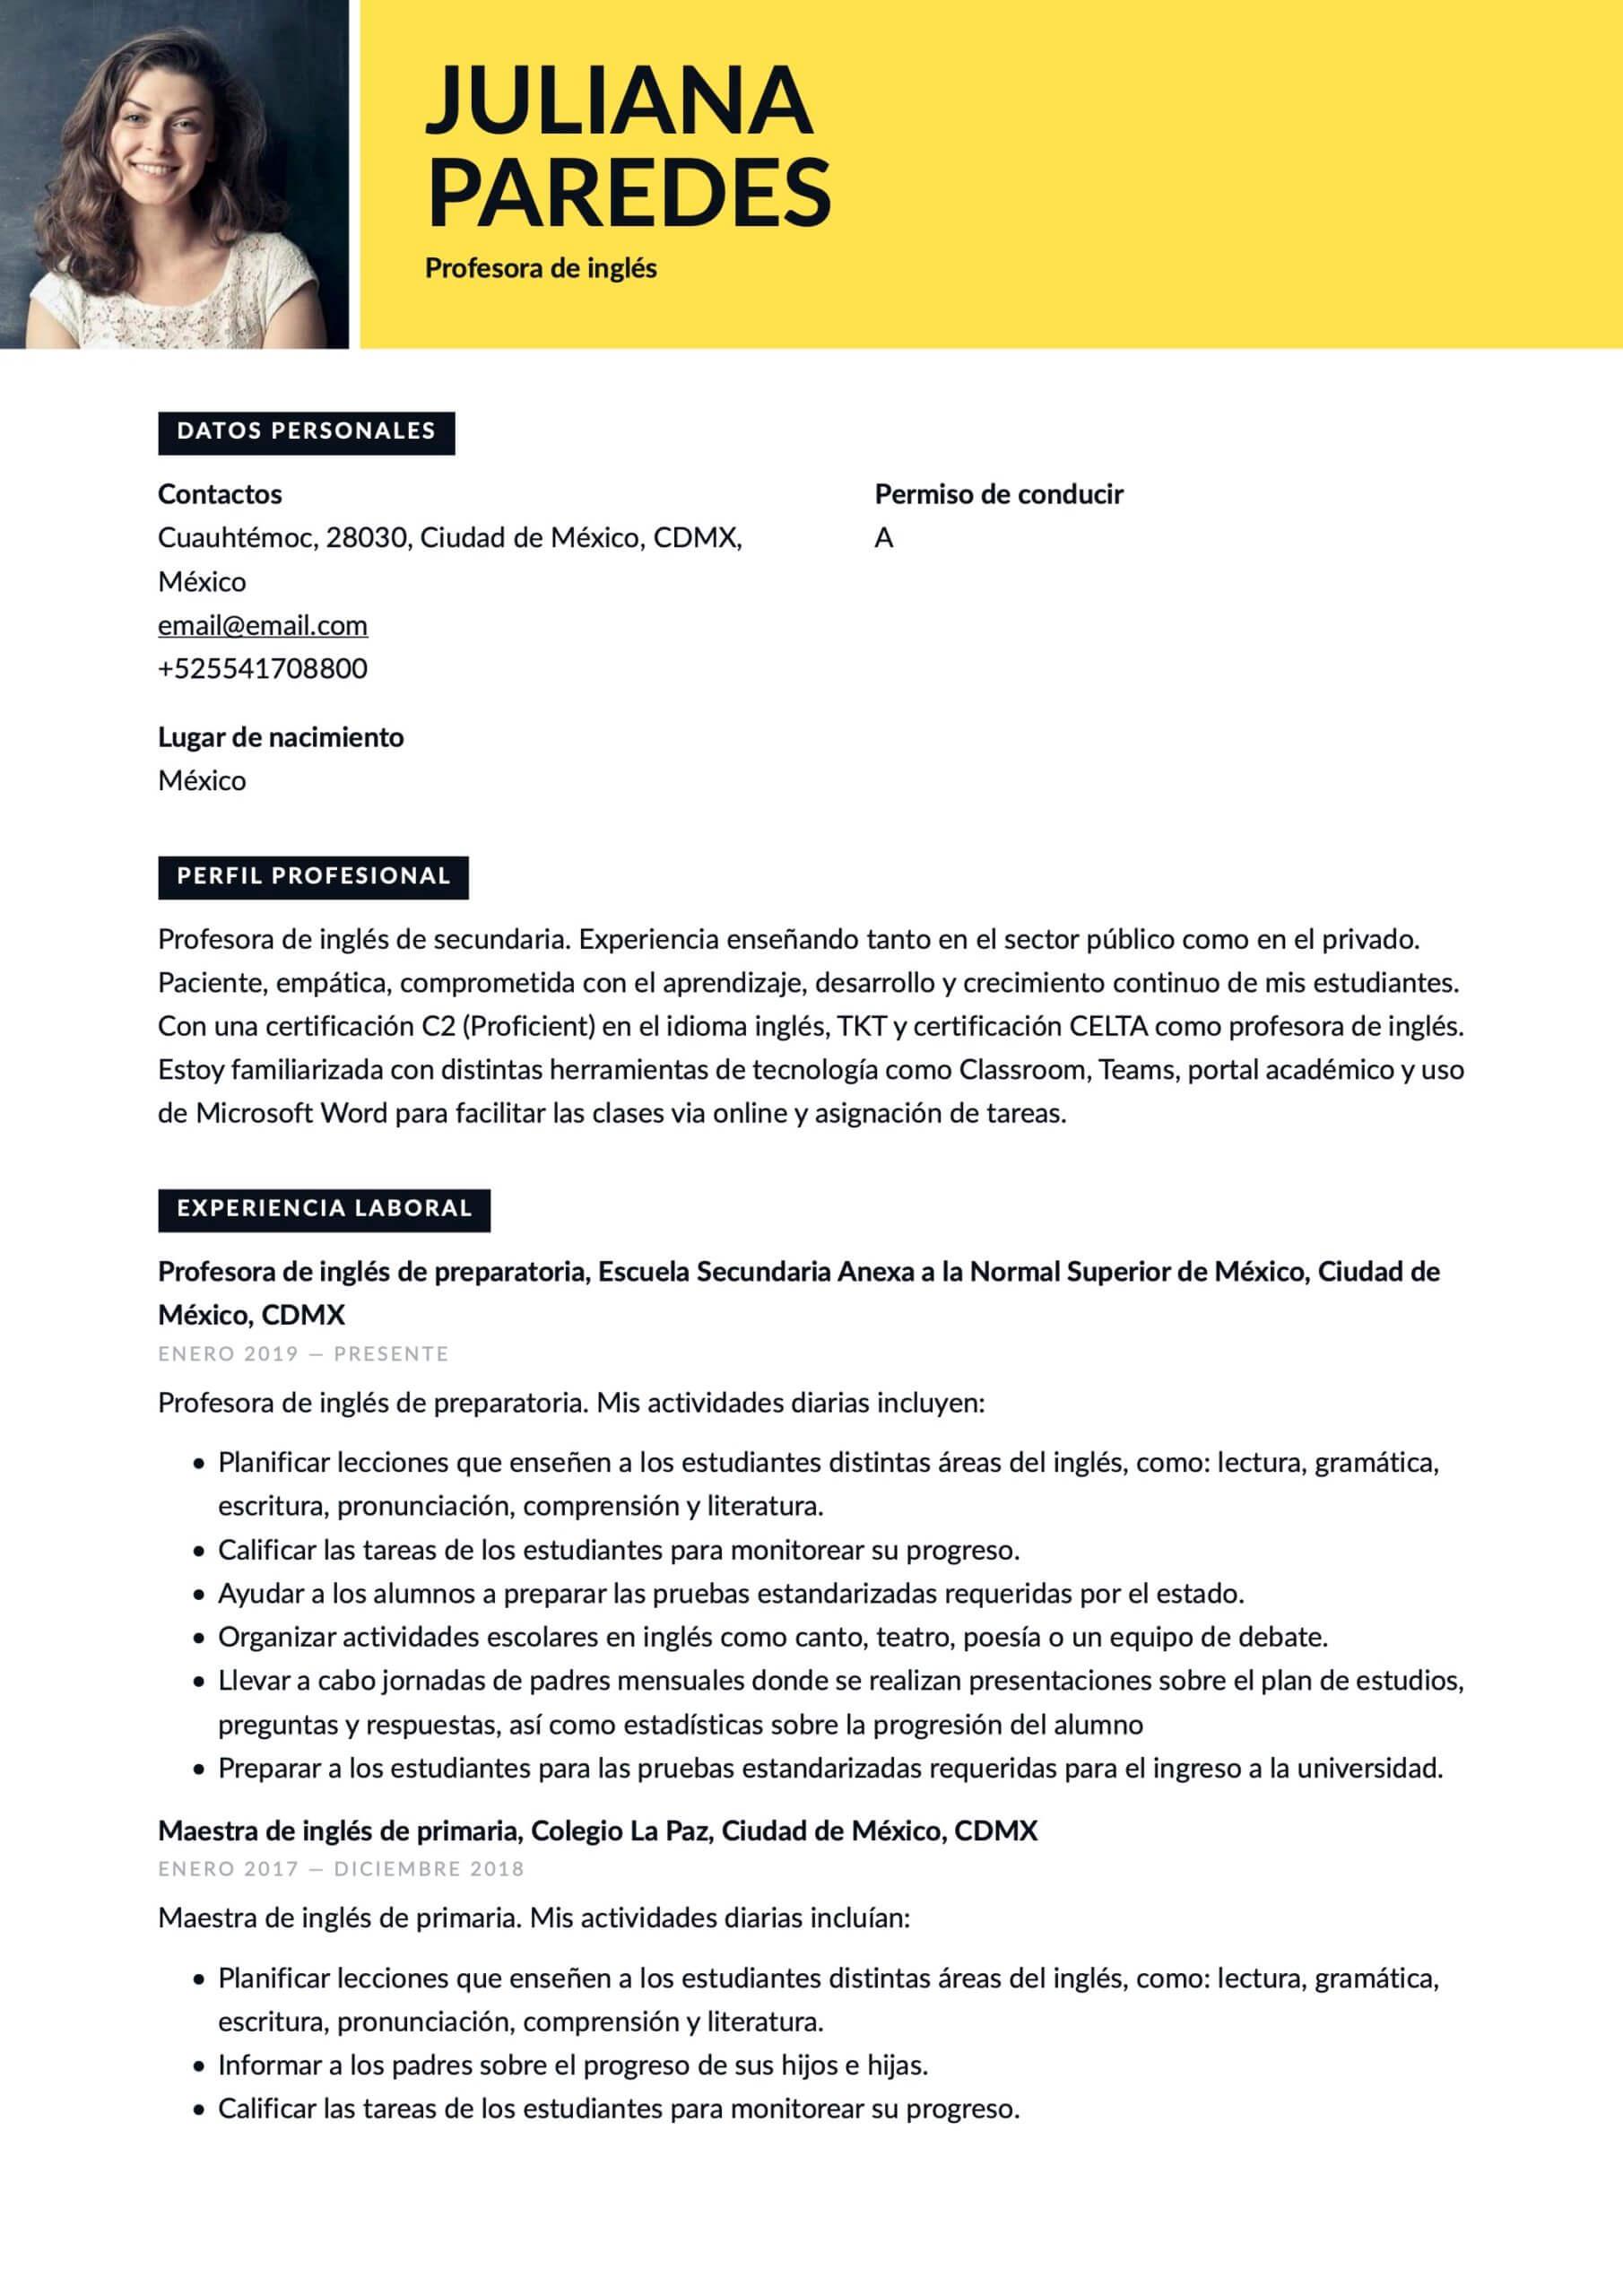 Currículum para Profesor de inglés